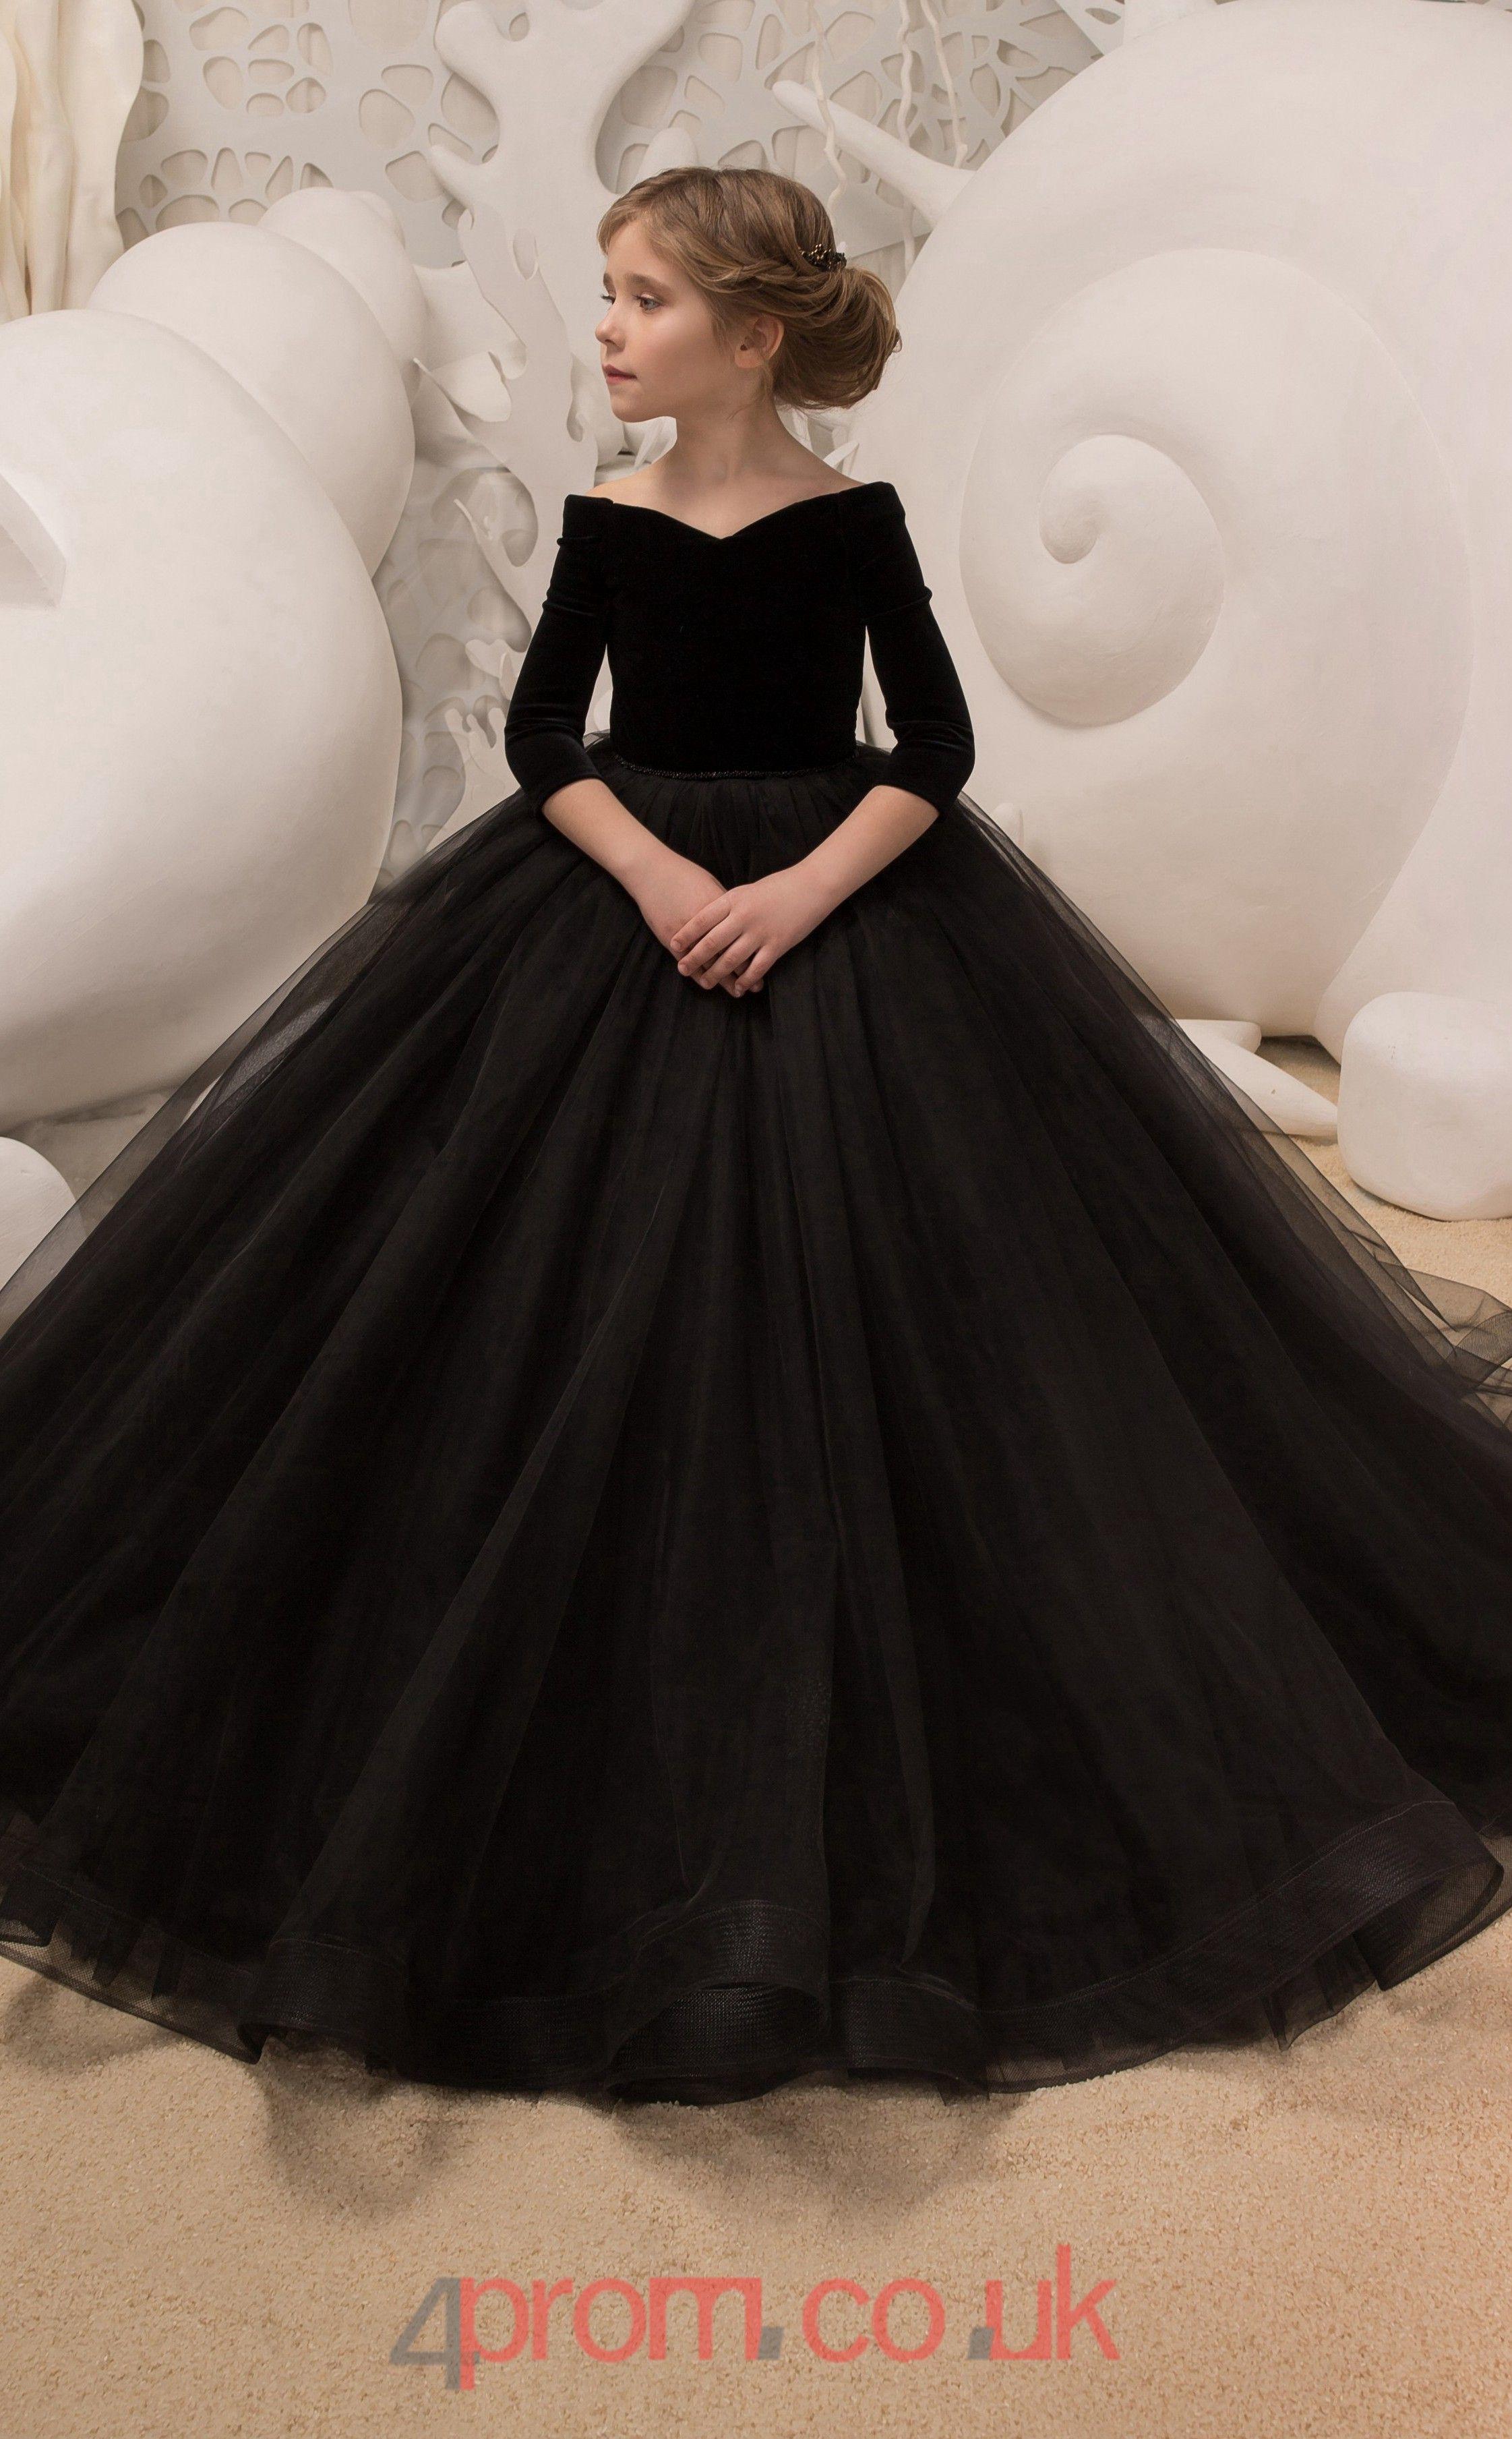 5e702457ac6 Scalloped 3 4 Length Sleeve Black Kids Prom Dresses CHK037 Toddler Prom  Dresses